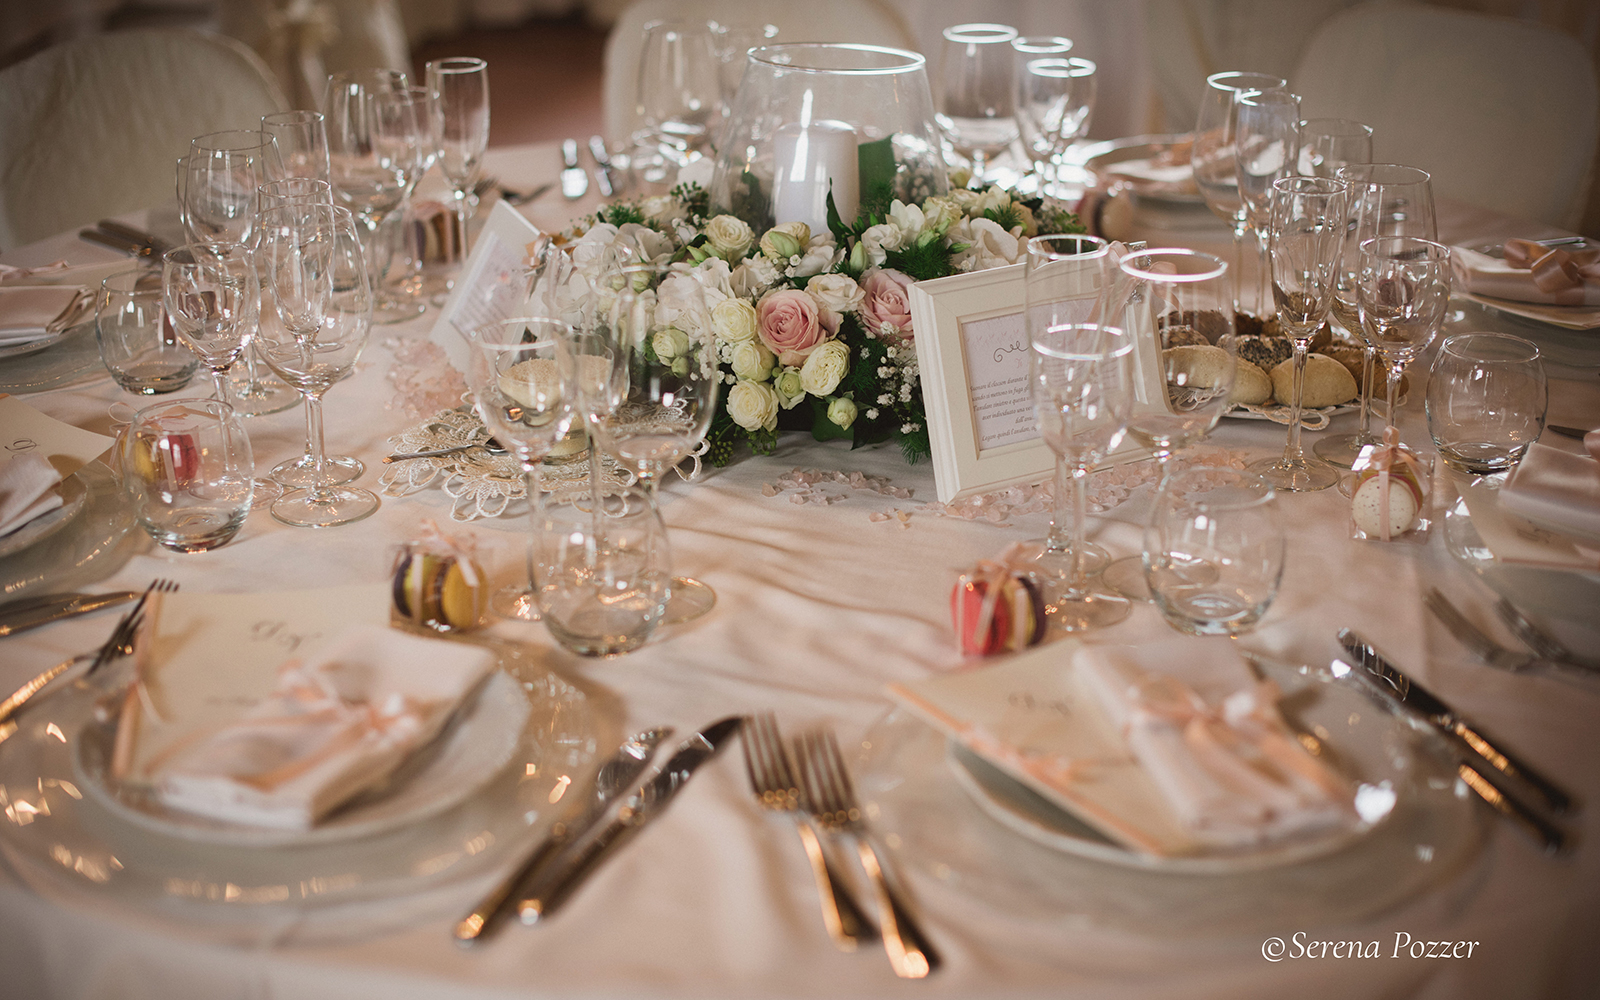 Vicenza ricevimento matrimonio Vicenza matrimonio ricevimento , villa per eventi, villa per eventi Vicenza